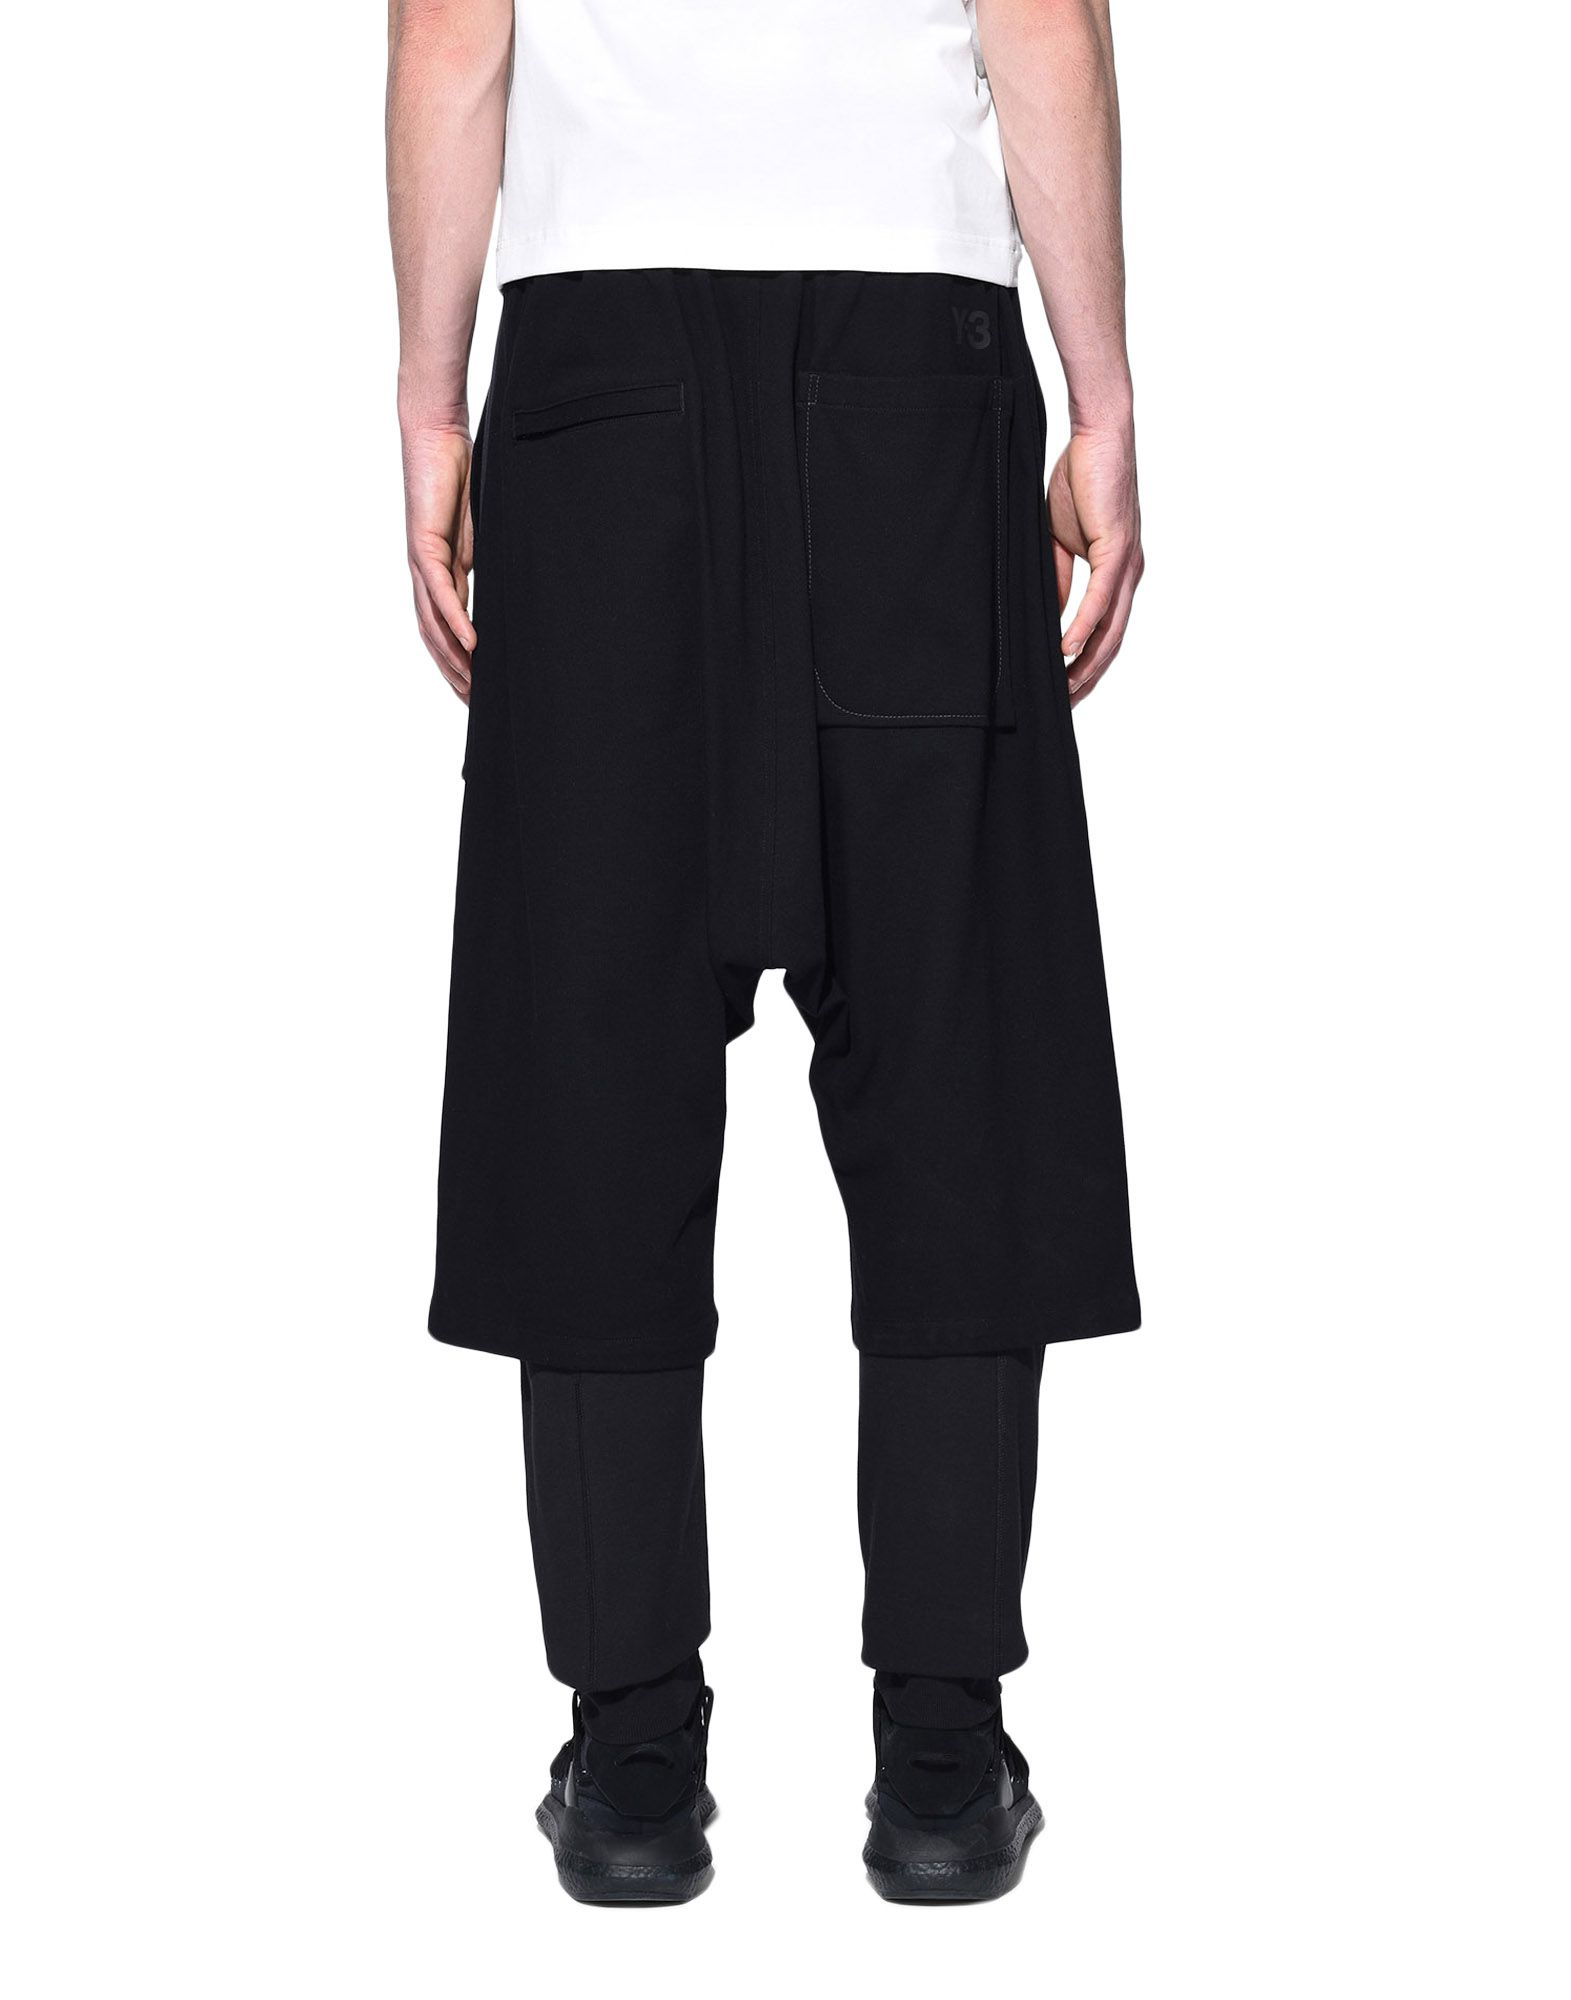 Y-3 Y-3 Sarouel Shorts Sport-Shorts Herren d